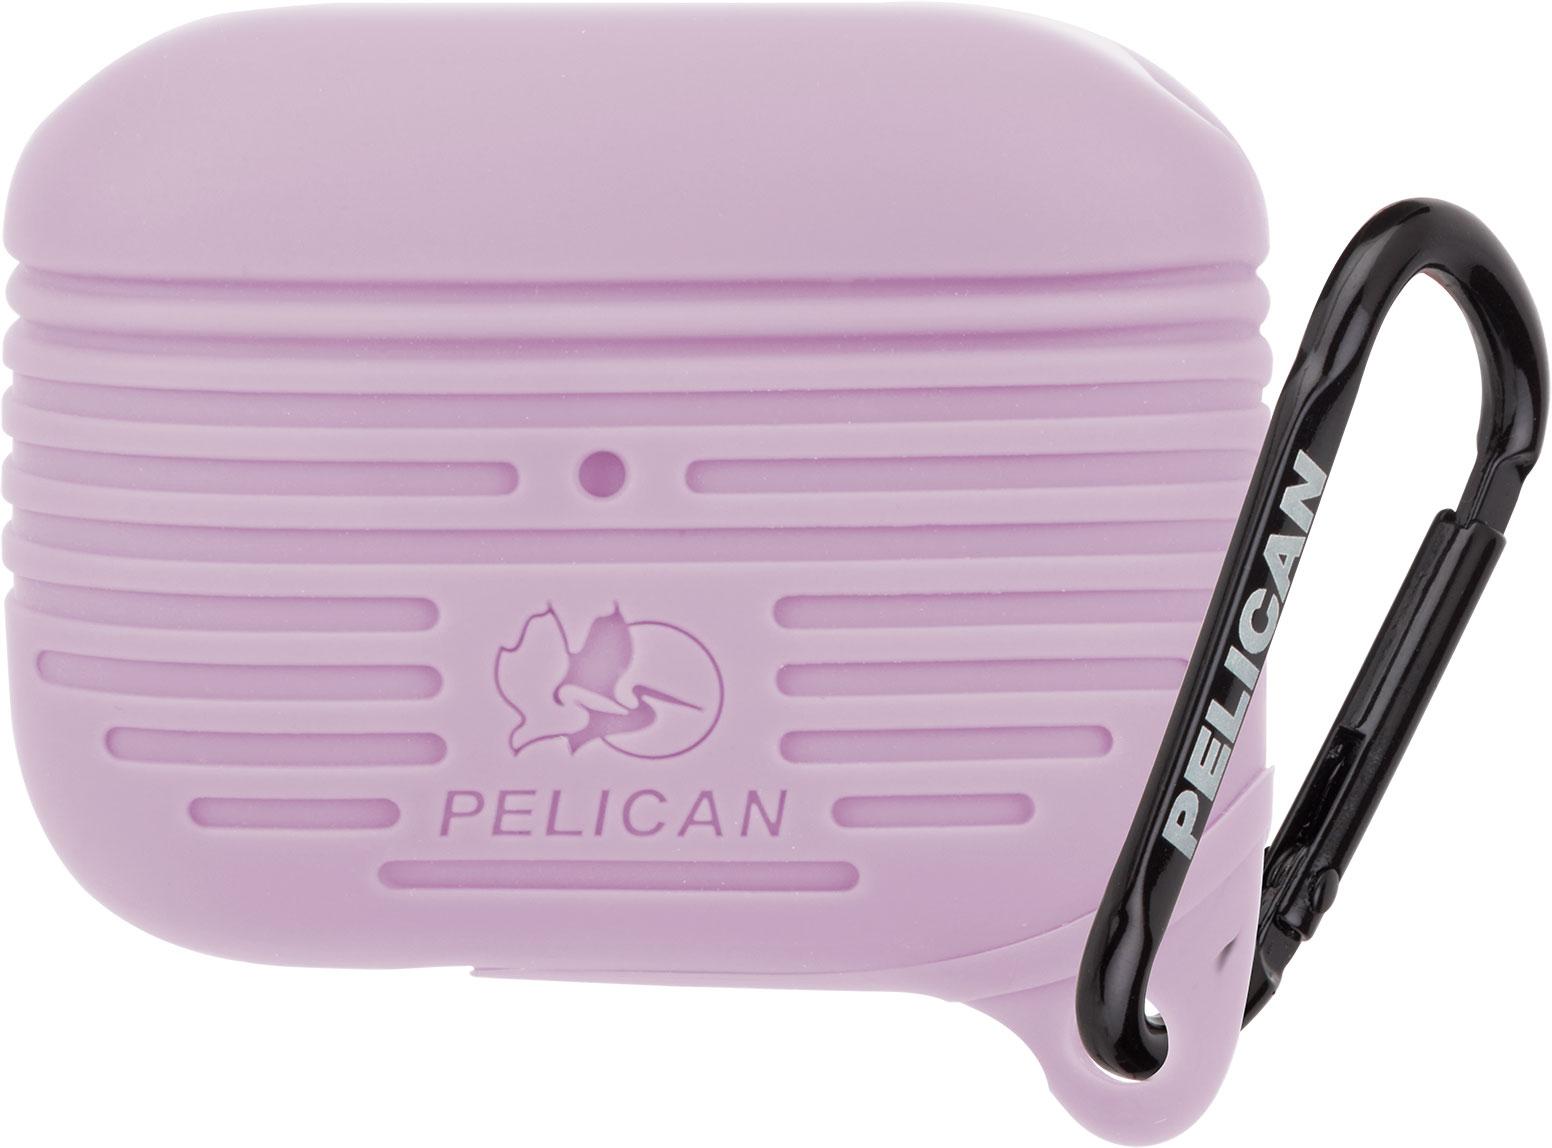 pelican pink apple airpod pro case